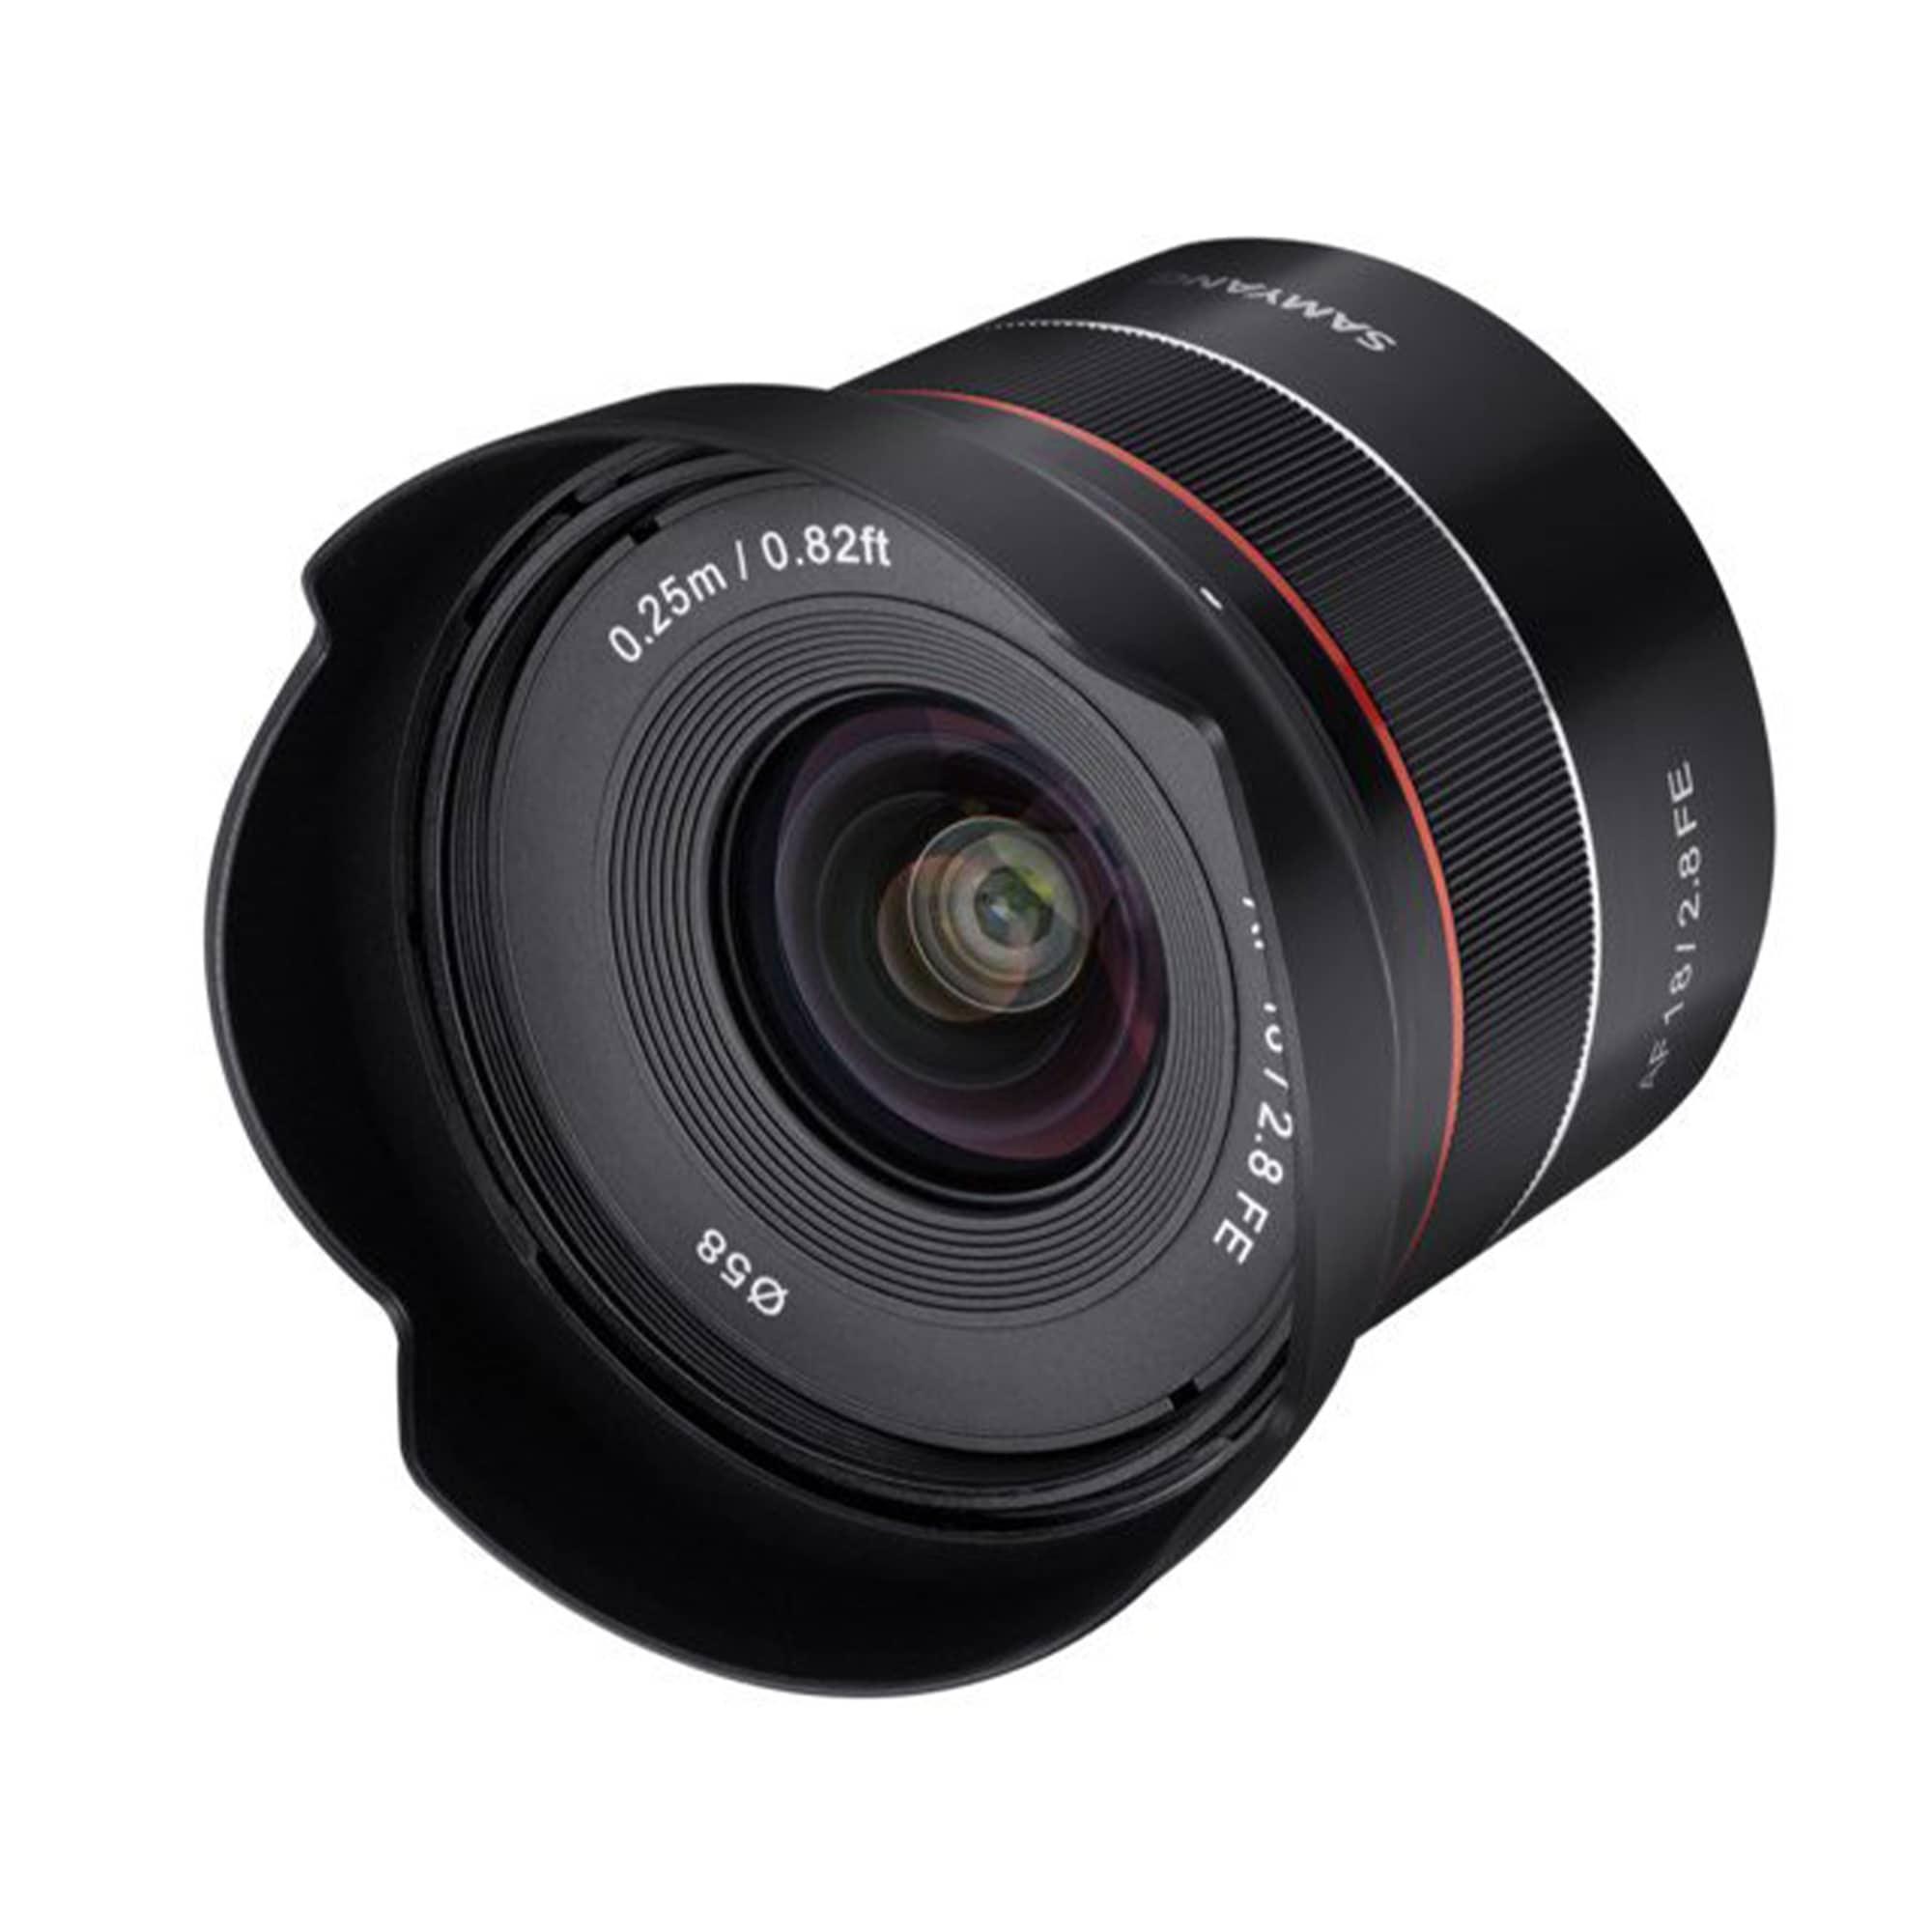 samyang-sideview-18mm